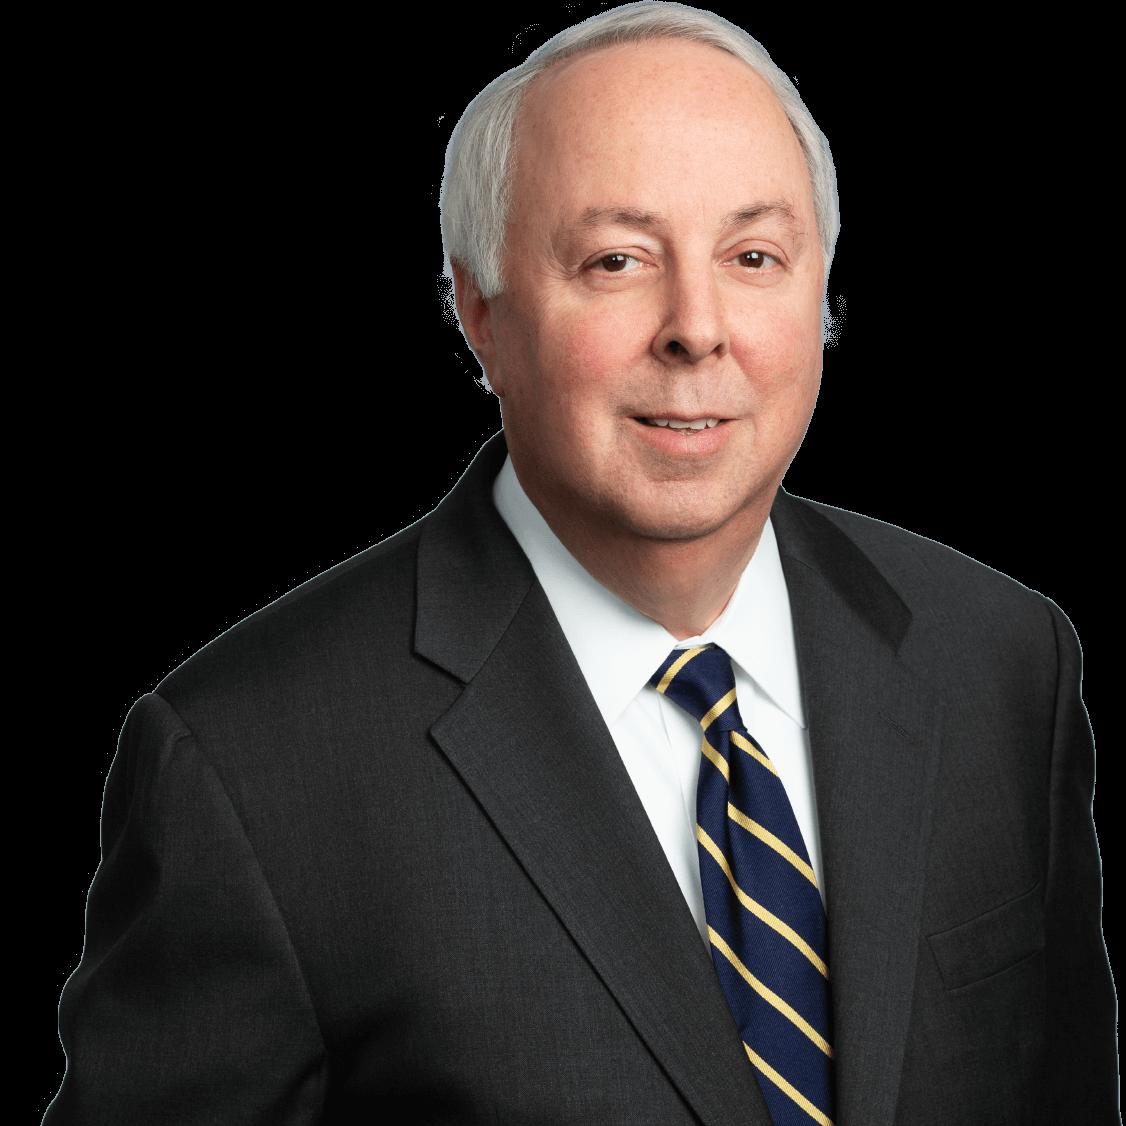 Jeff J. Friedman